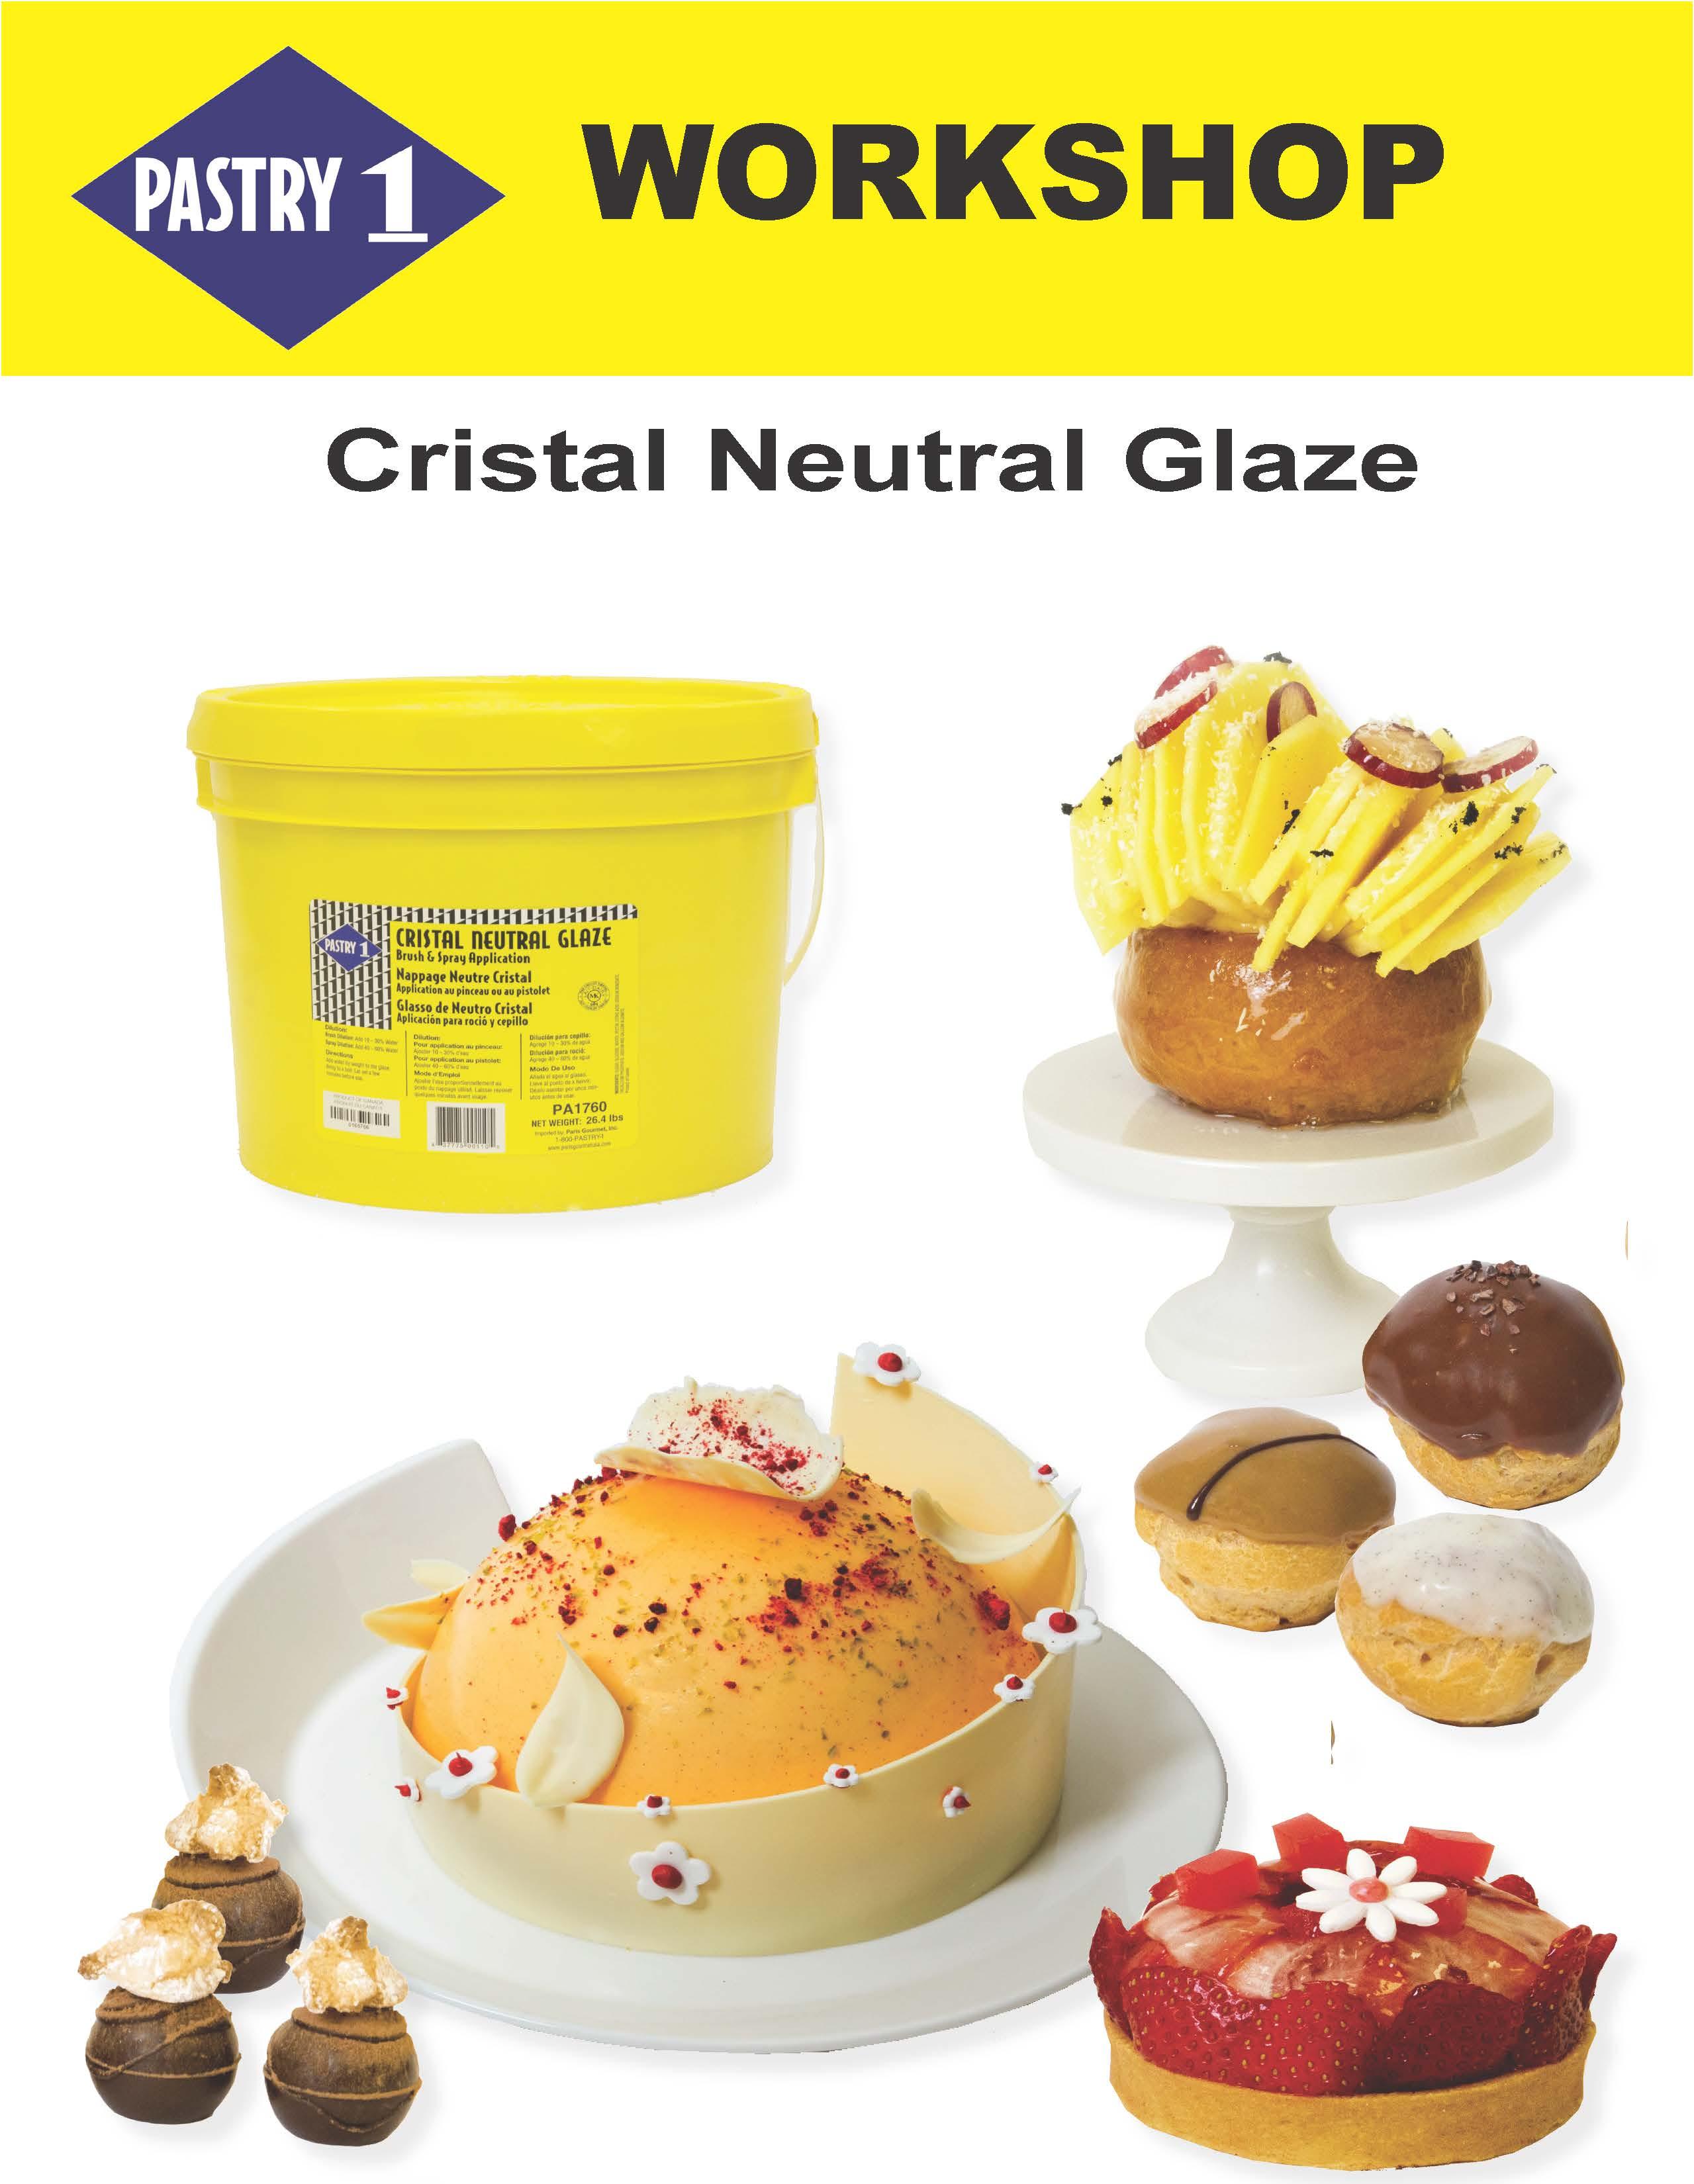 Cover_Cristal_Neutral_Glaze_Brochure.jpg